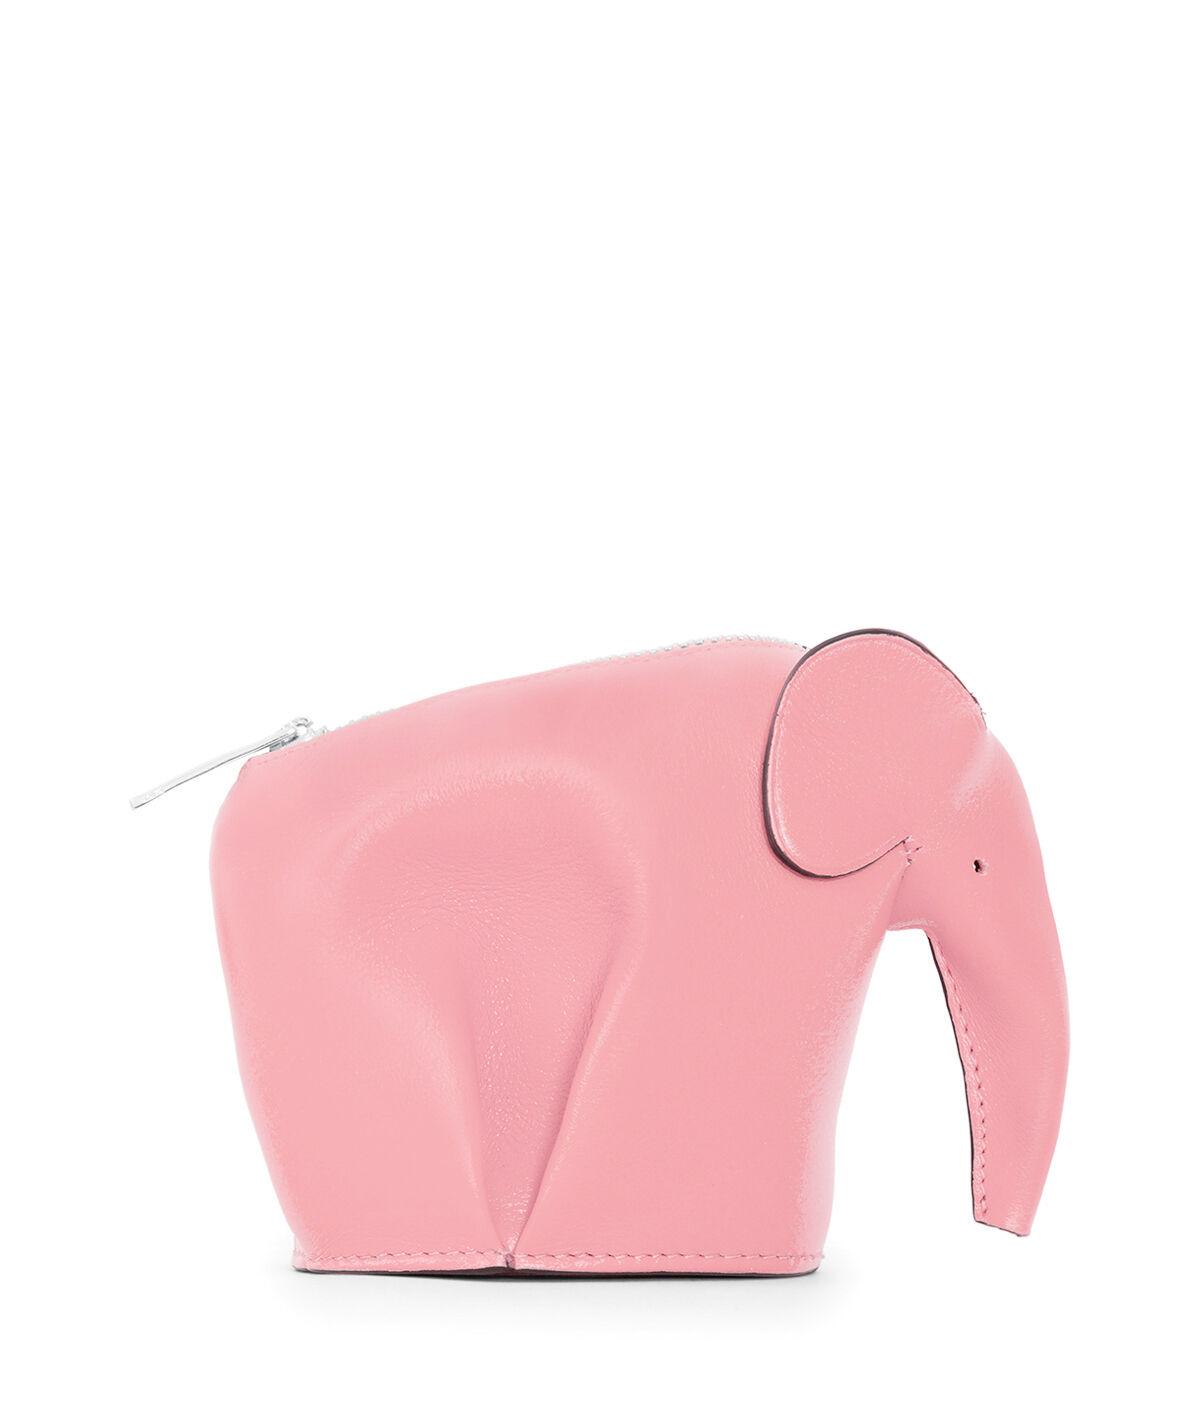 LOEWE Monedero Elefante Candy all